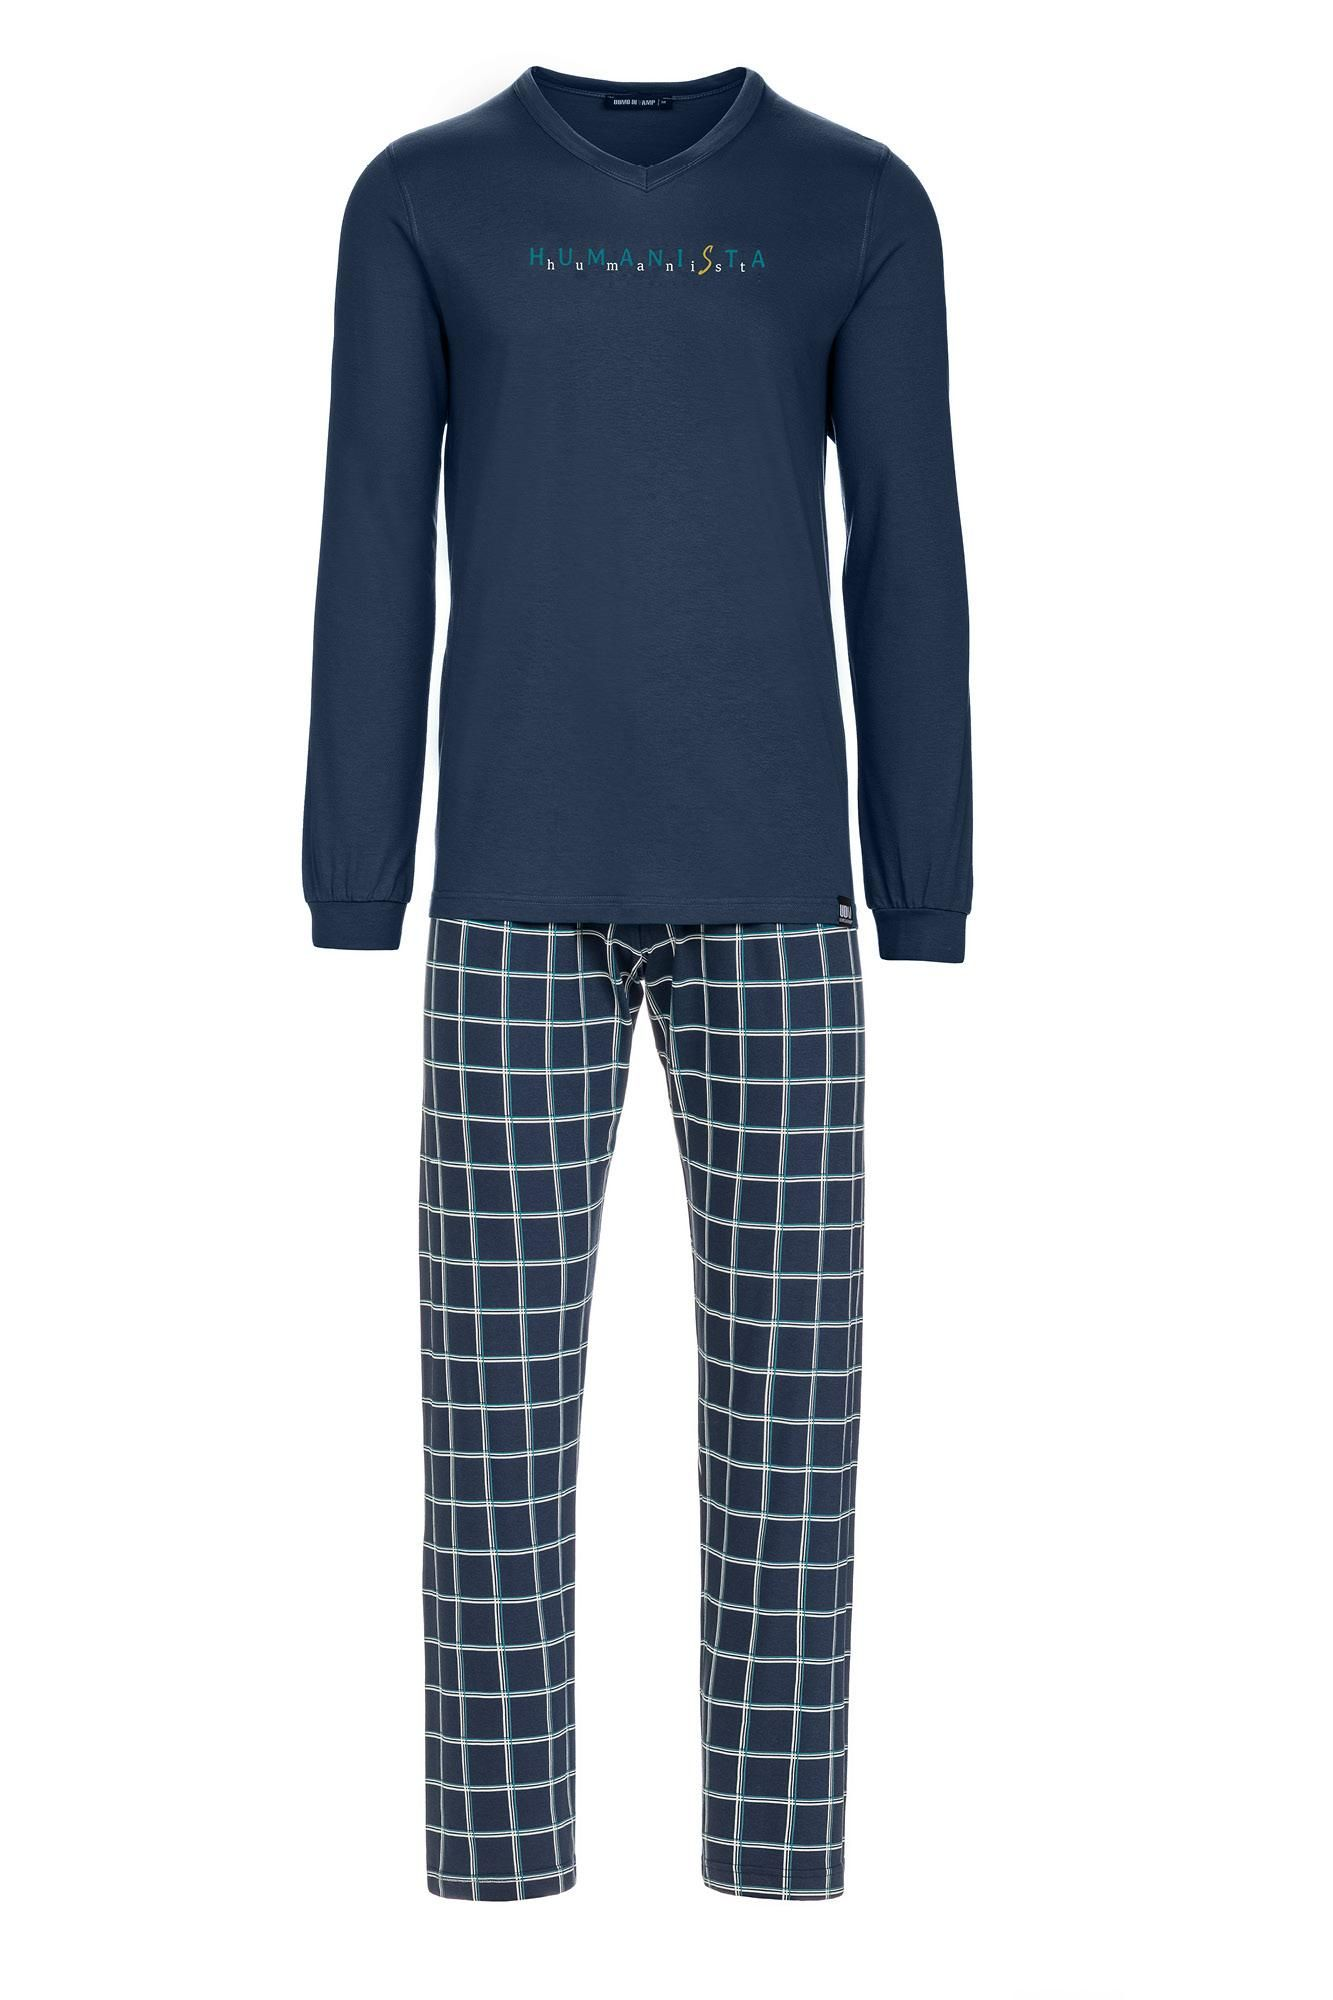 Men's Plaid Pyjamas Plus Size